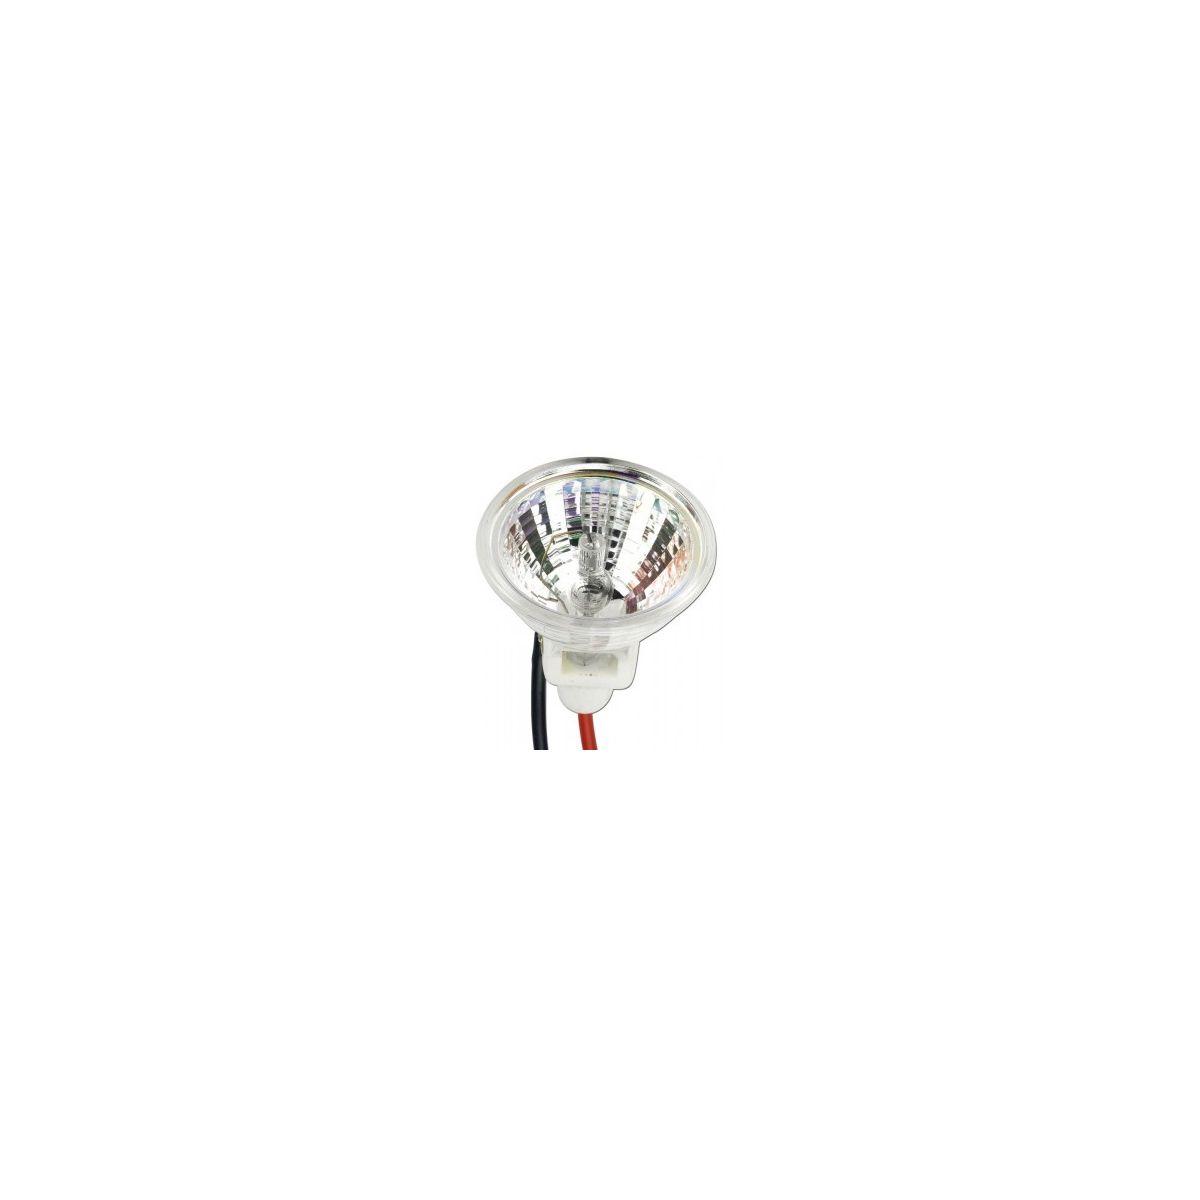 Ampoules halogènes - Osram / GE / Philips - HID 150